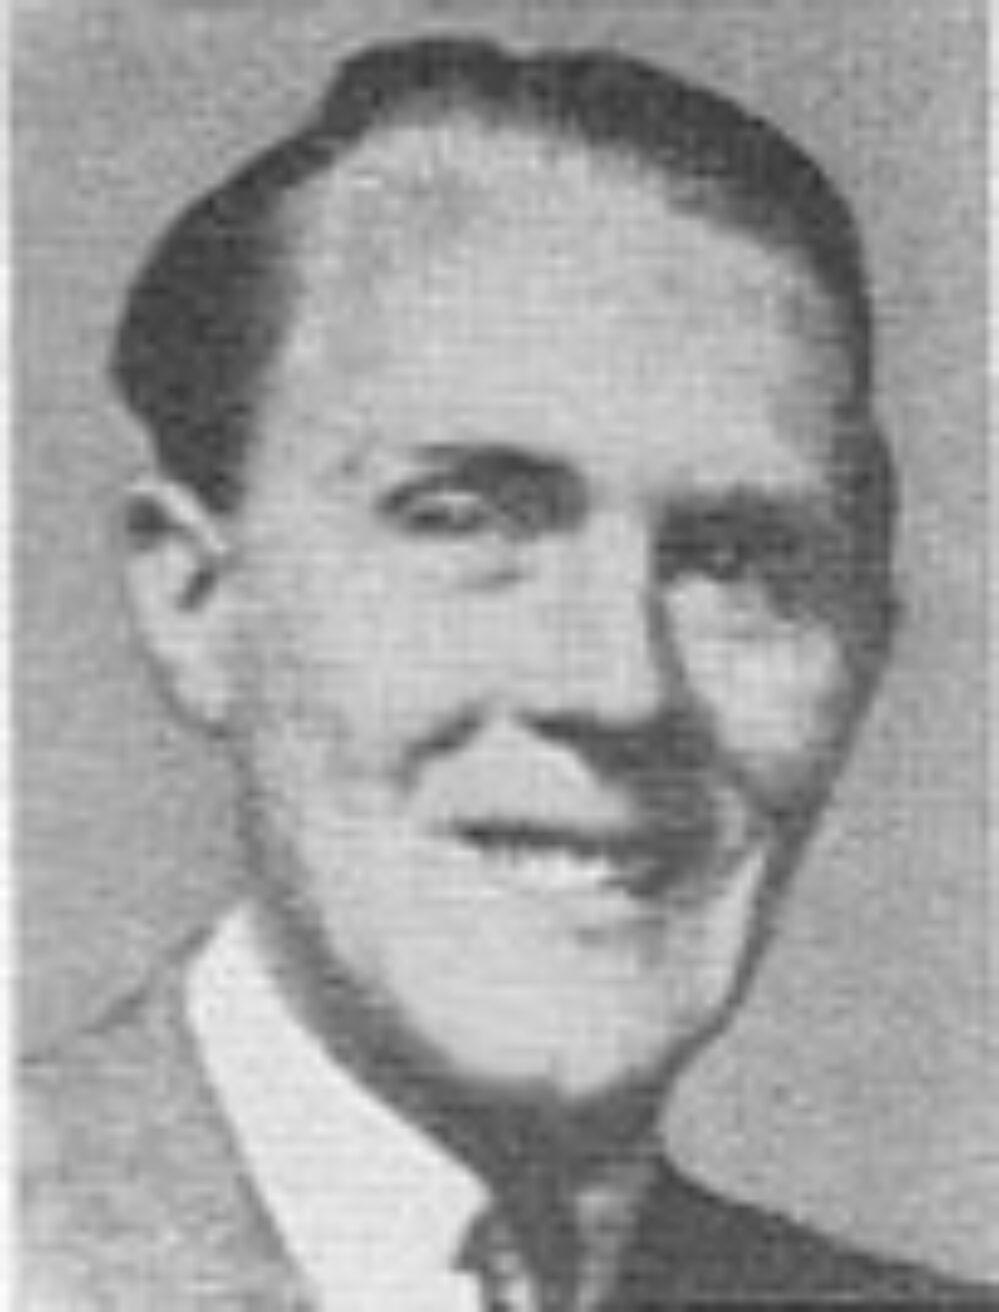 Kjell Mjøs